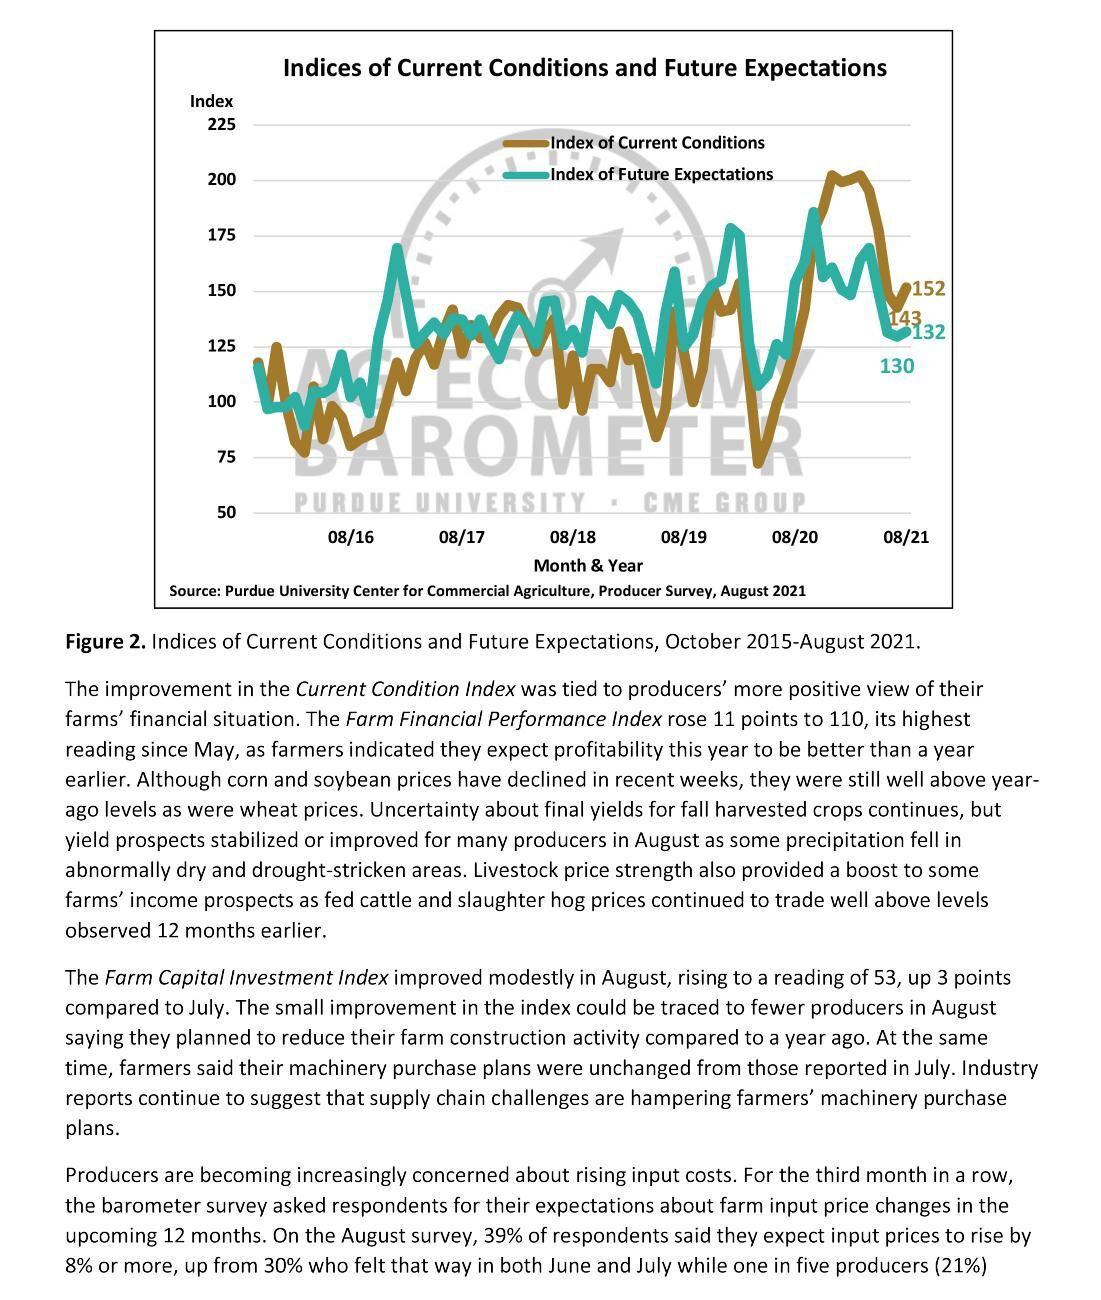 090921-agrv-mark-agbarometer-2.pdf